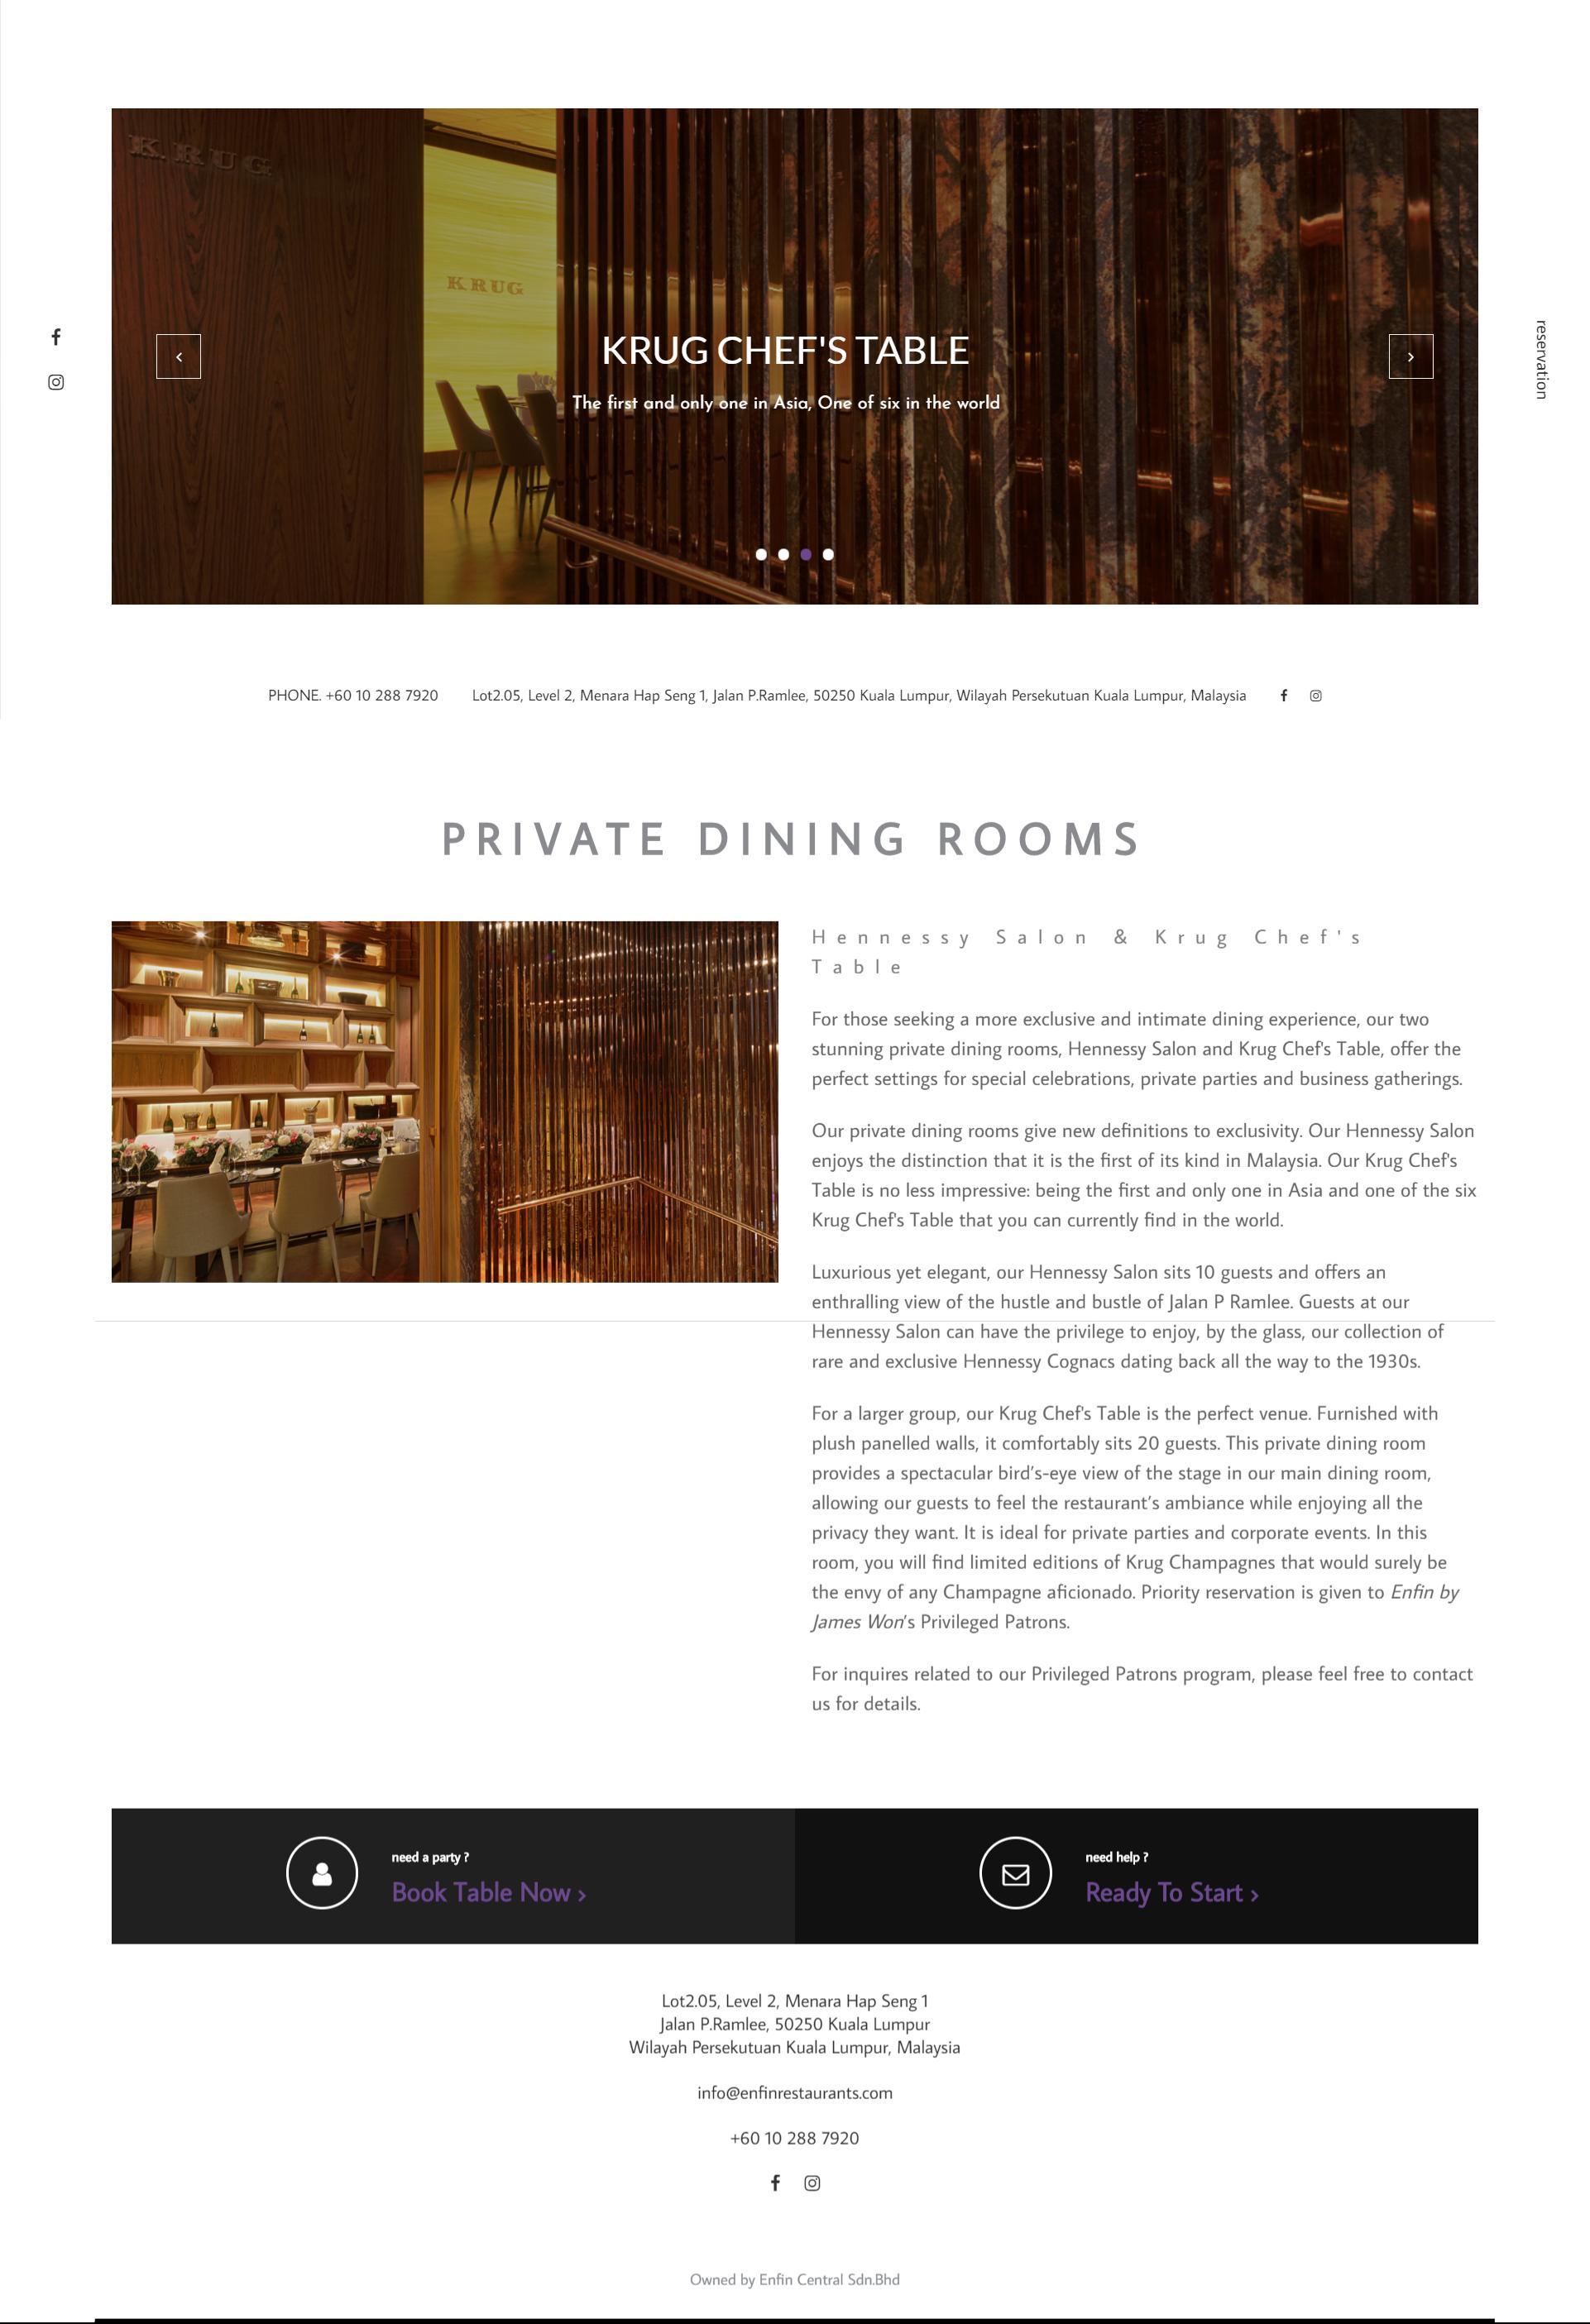 Website design for Enfin by James Won